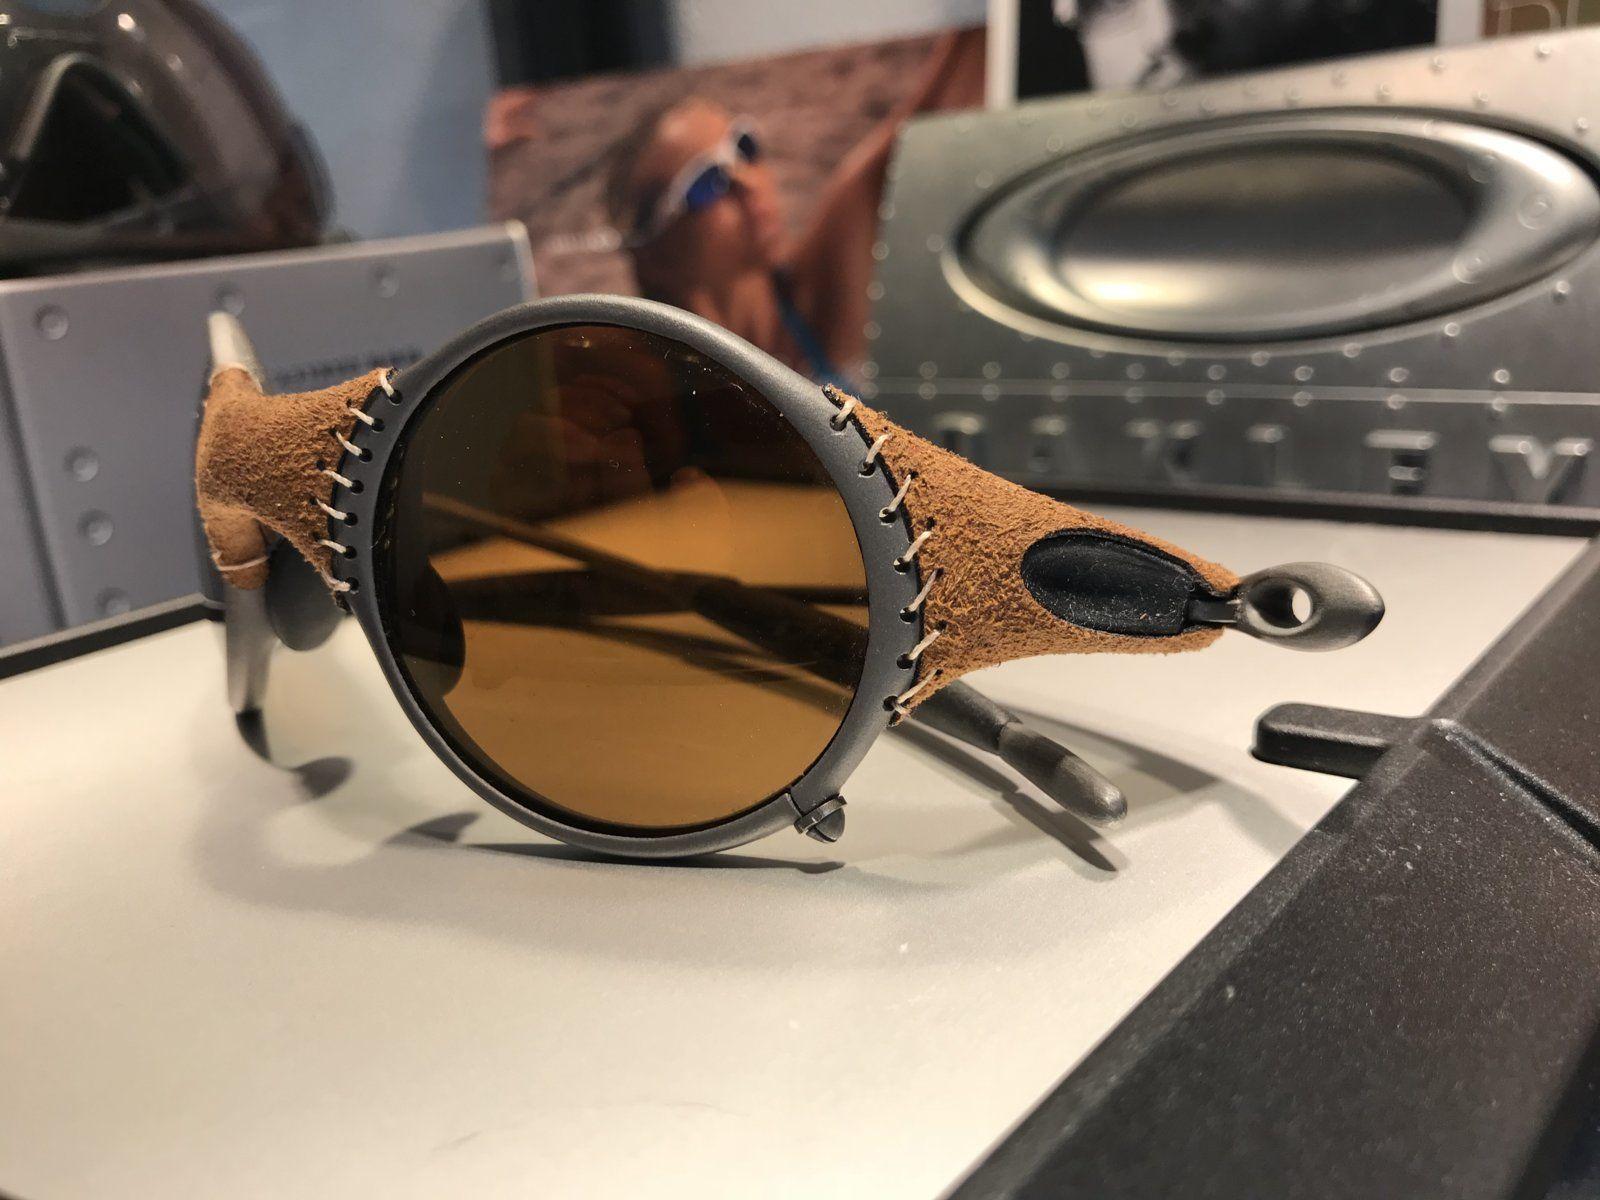 ... Mars leather w  gold Iridium SKU  04-104 Michael Jordan edition -  261E34C5 ... 68a9ac9a50